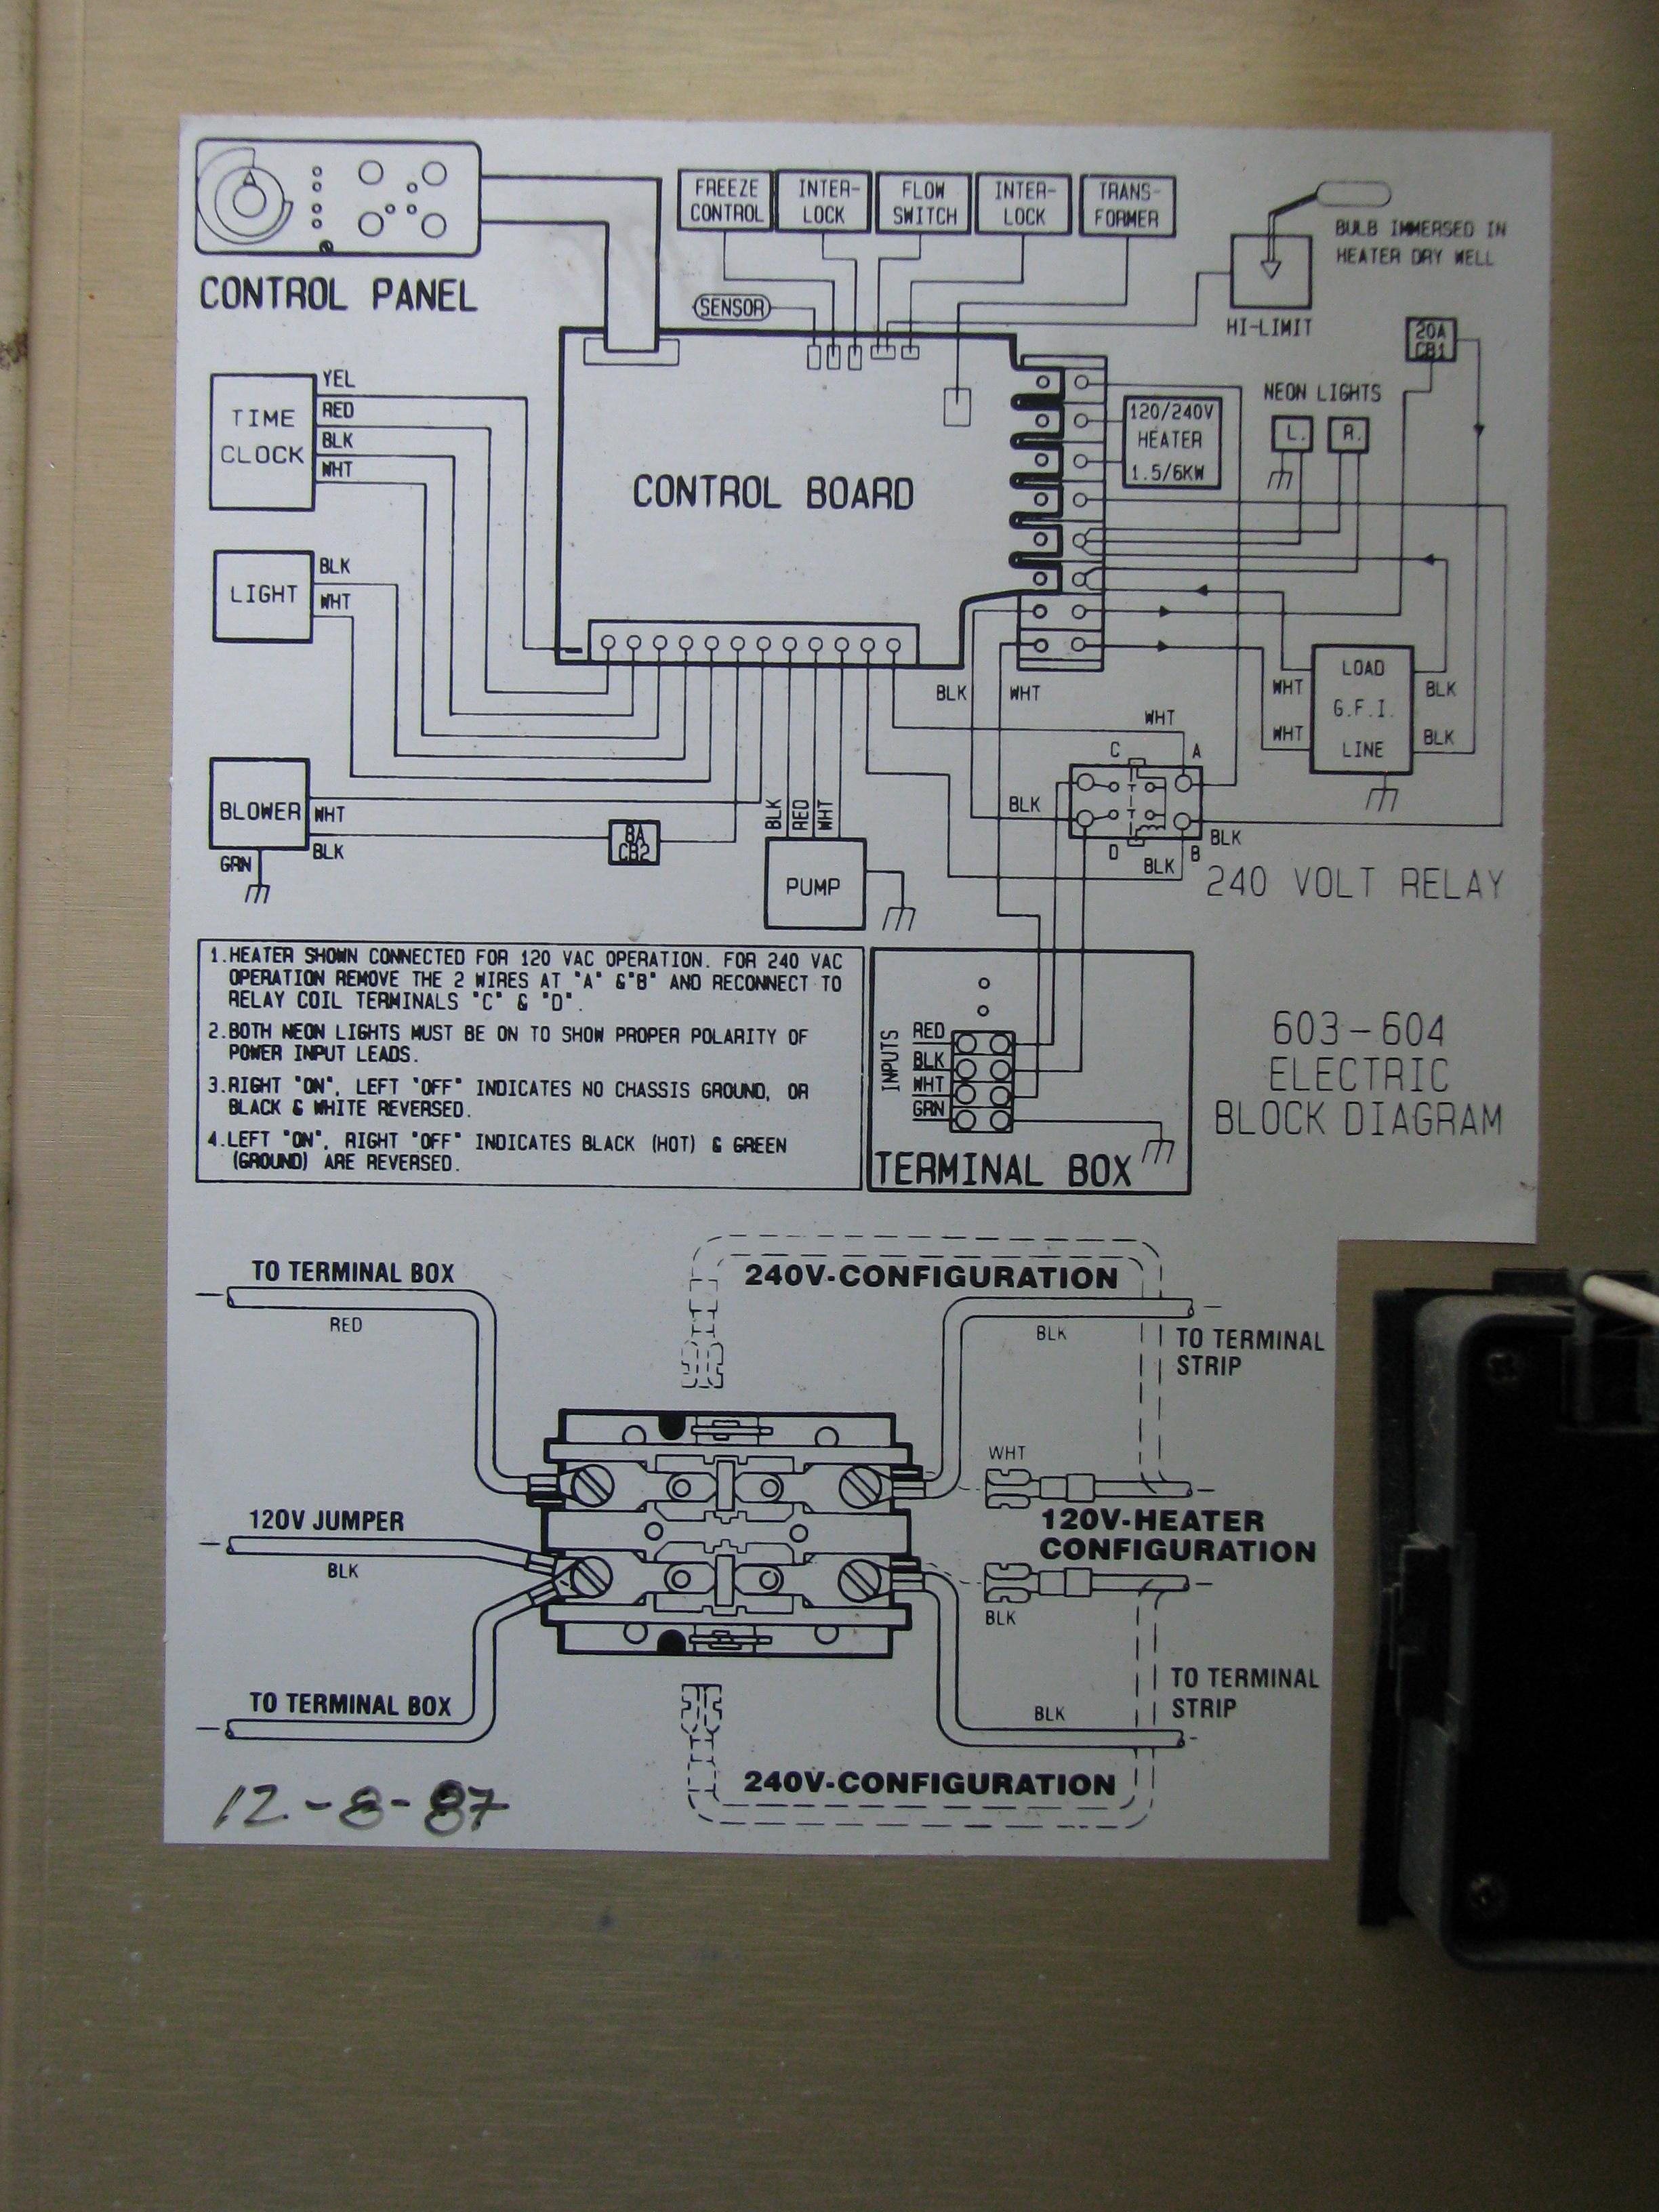 Hot Springs Spa Wiring Jumper Electrical Diagrams Watkins Diagram Ecospas Diy Enthusiasts U2022 Spas Tub